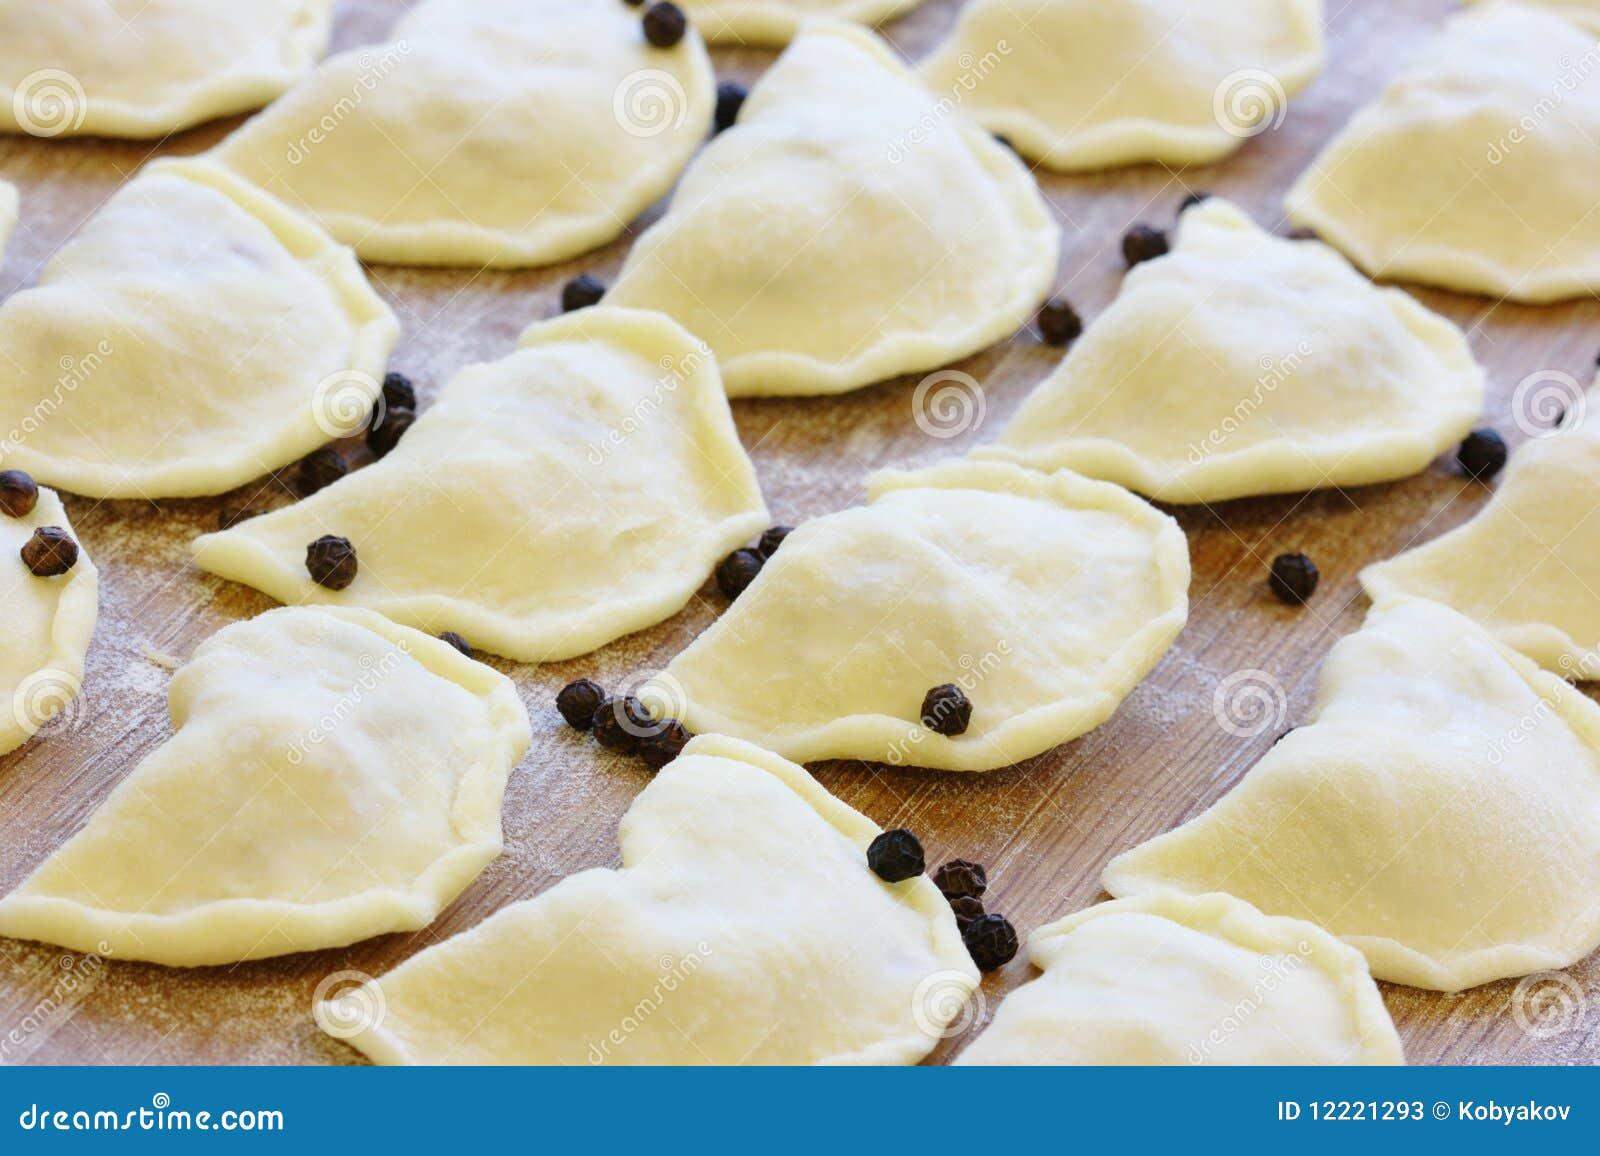 Boulettes crues de chou nourriture ukrainienne for Cuisine ukrainienne